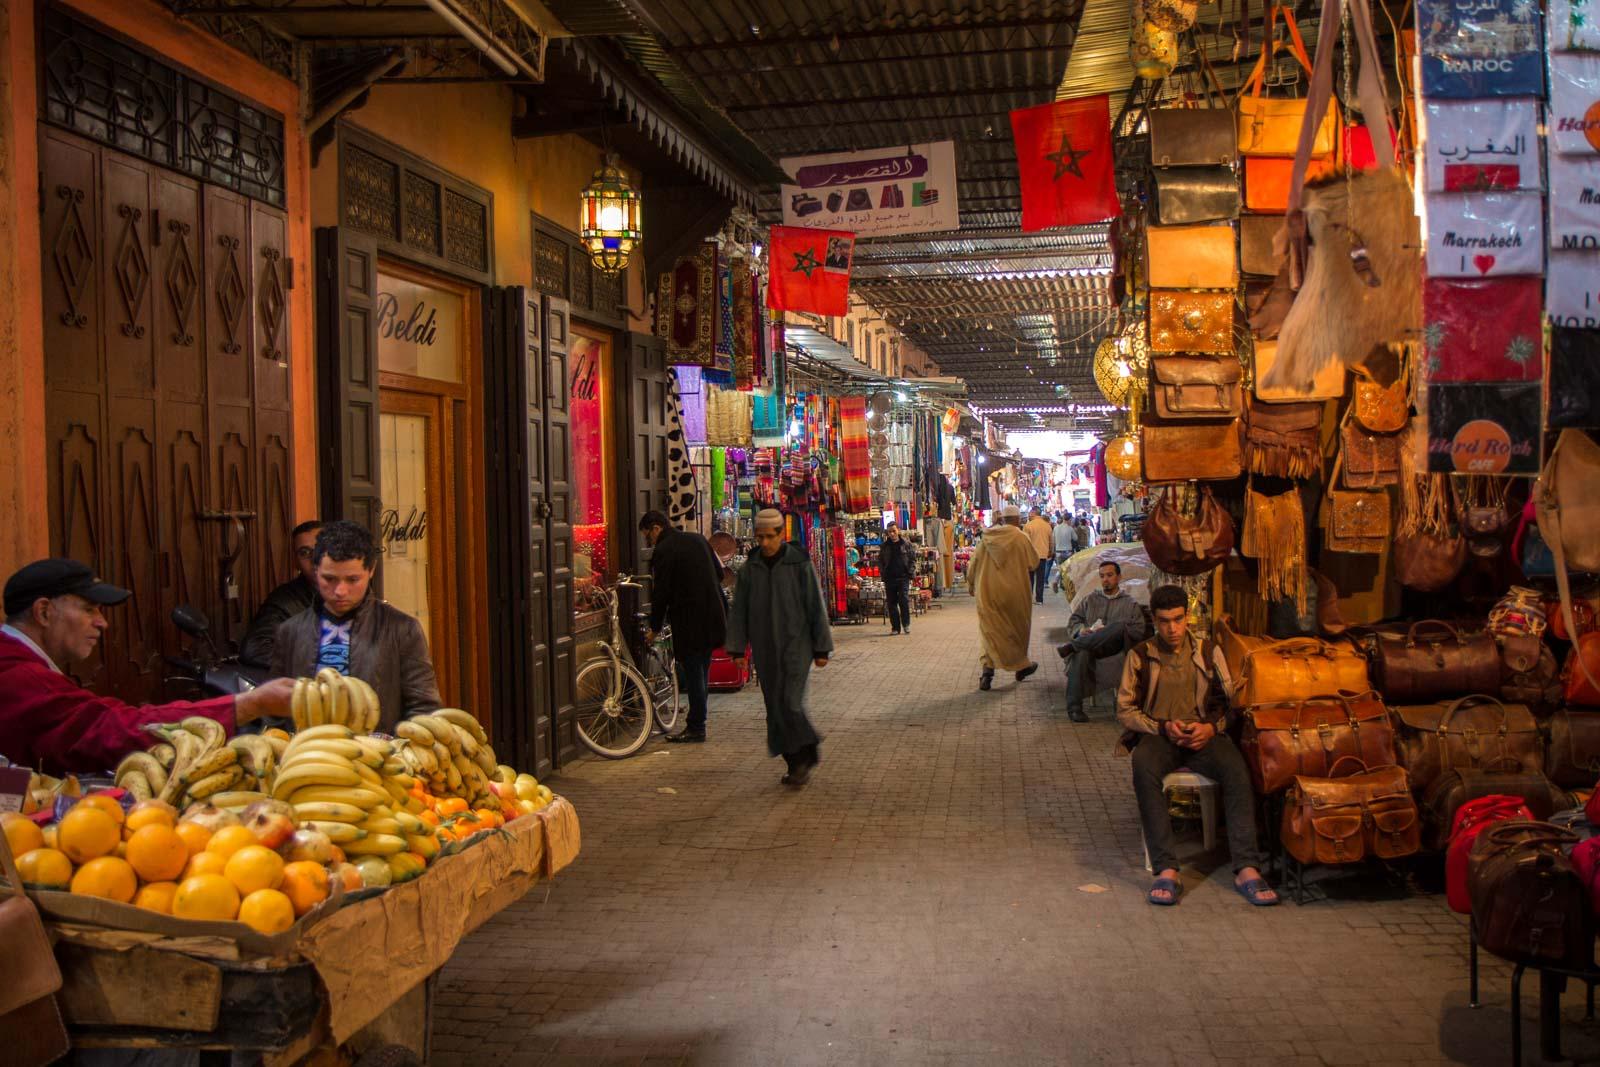 Os souks de Marrakech, em Marrocos.